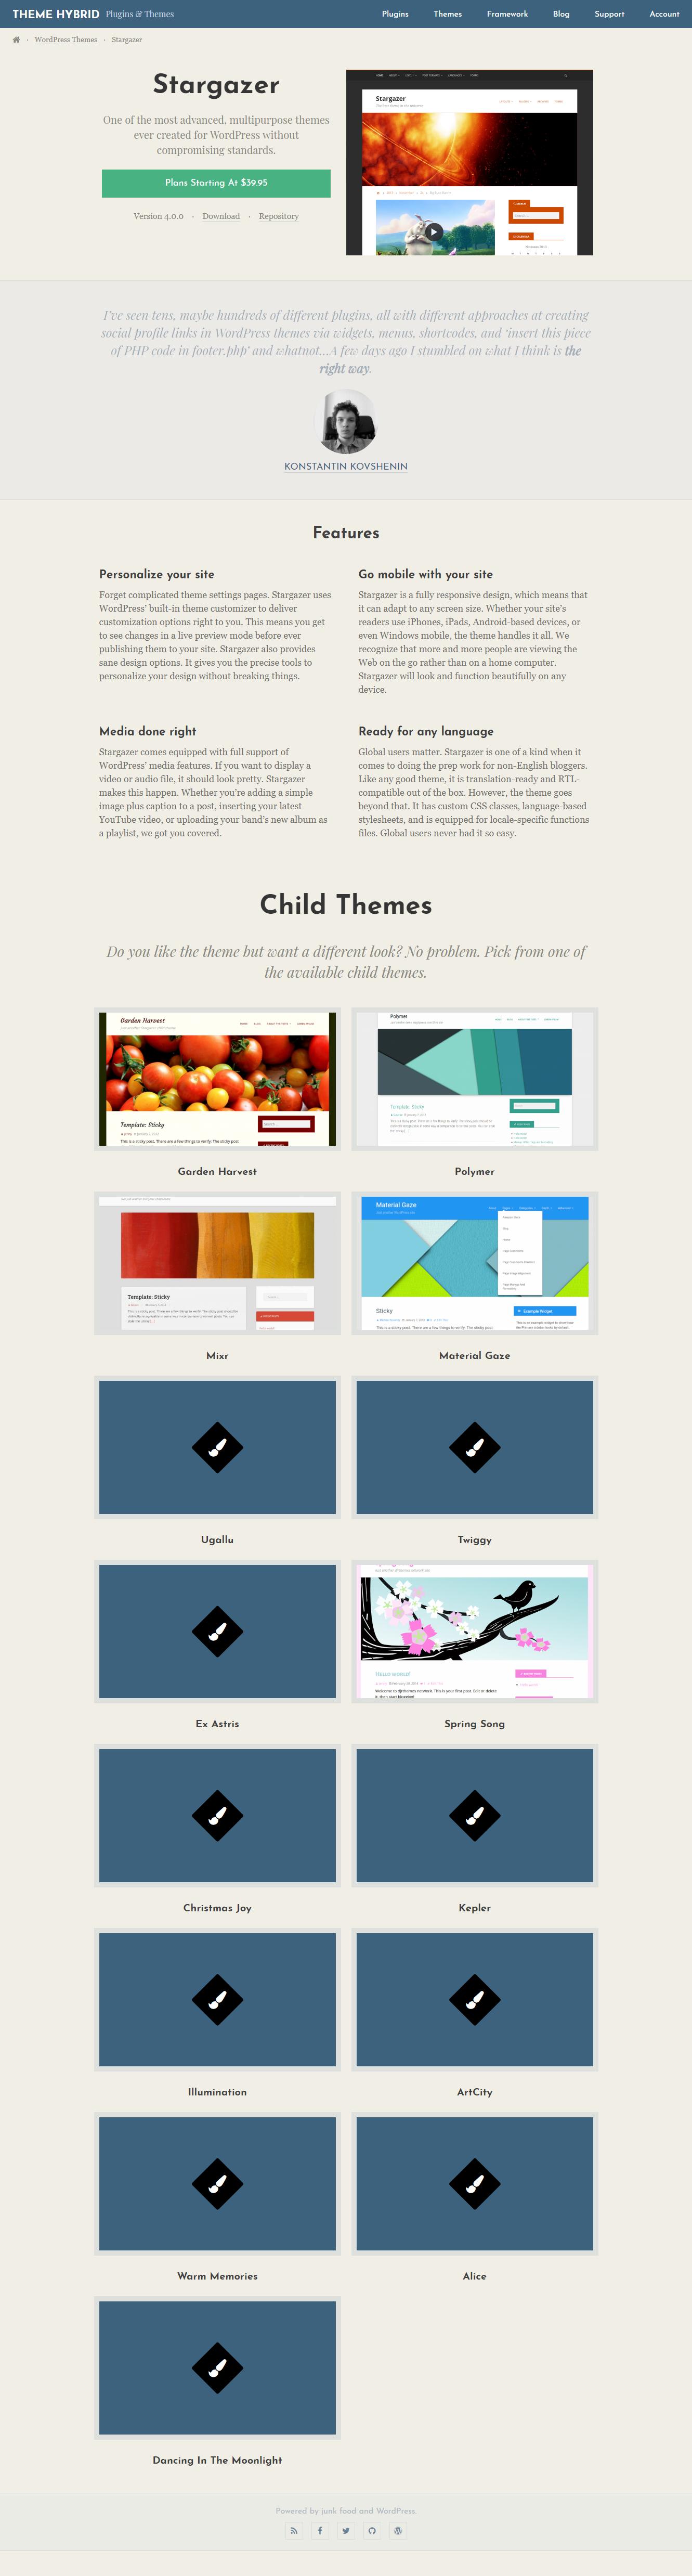 Stargazer - Best Free Material Design WordPress Theme